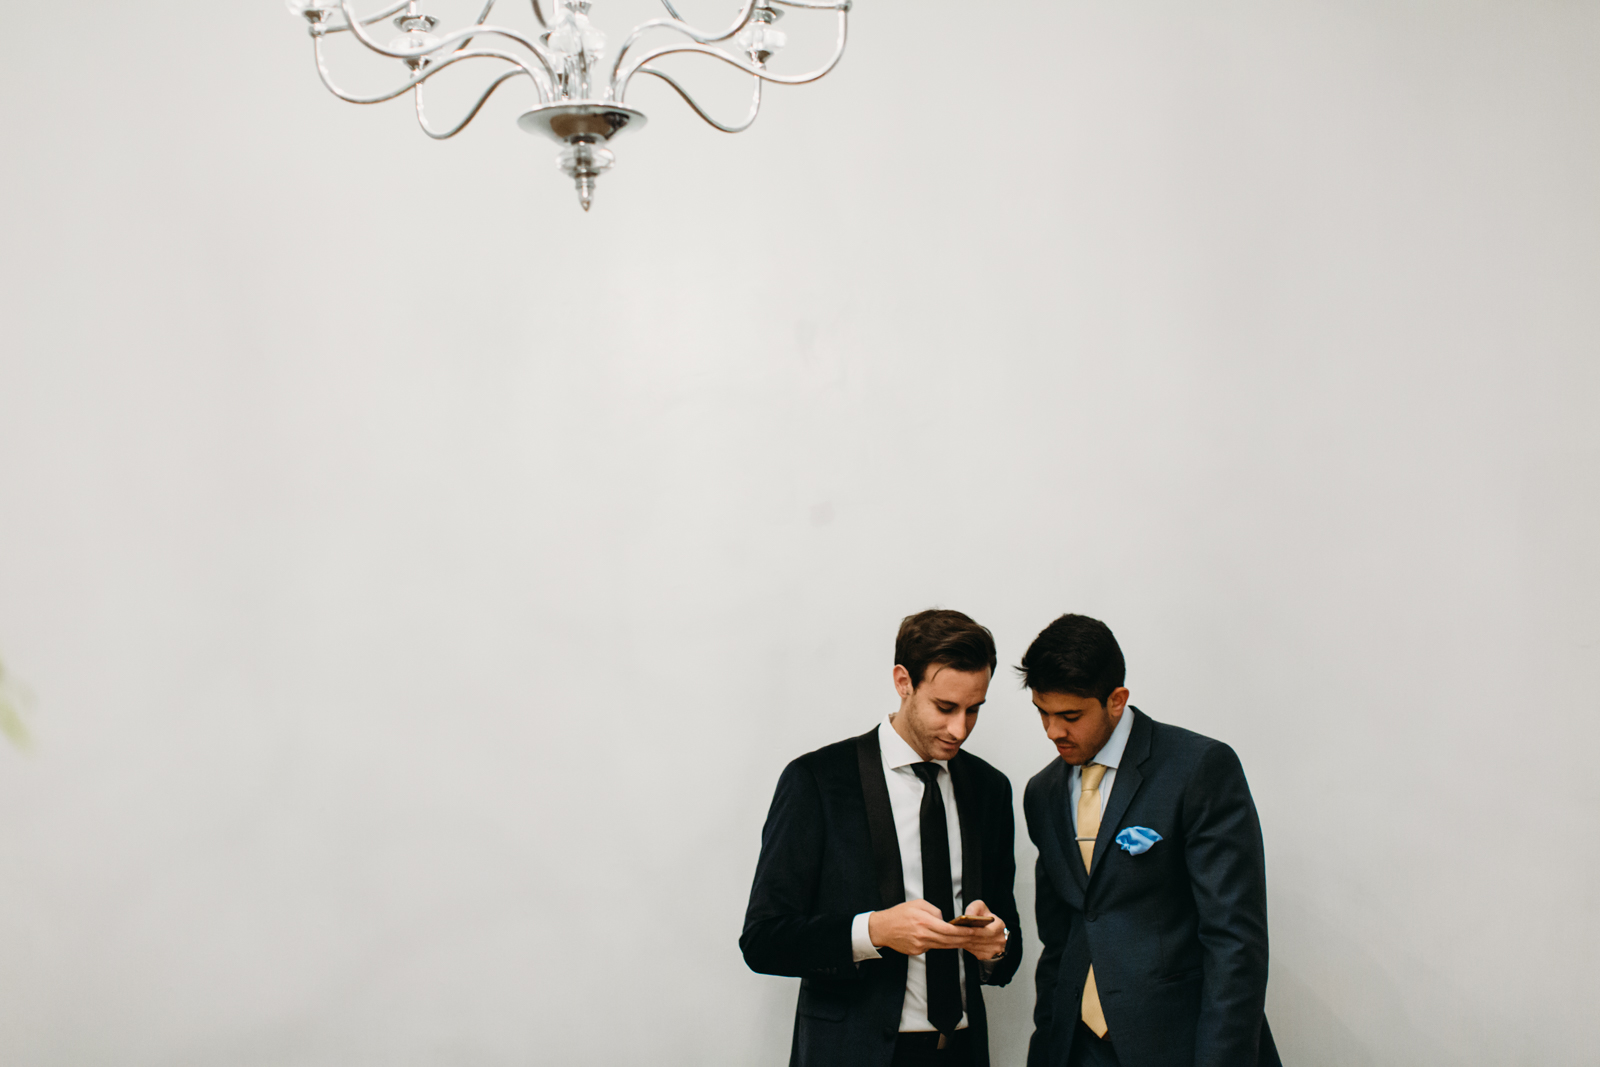 NYC Wedding Photography Lofts at Prince Brooklyn NYC Photographer Boris Zaretsky _B2C6051.jpg